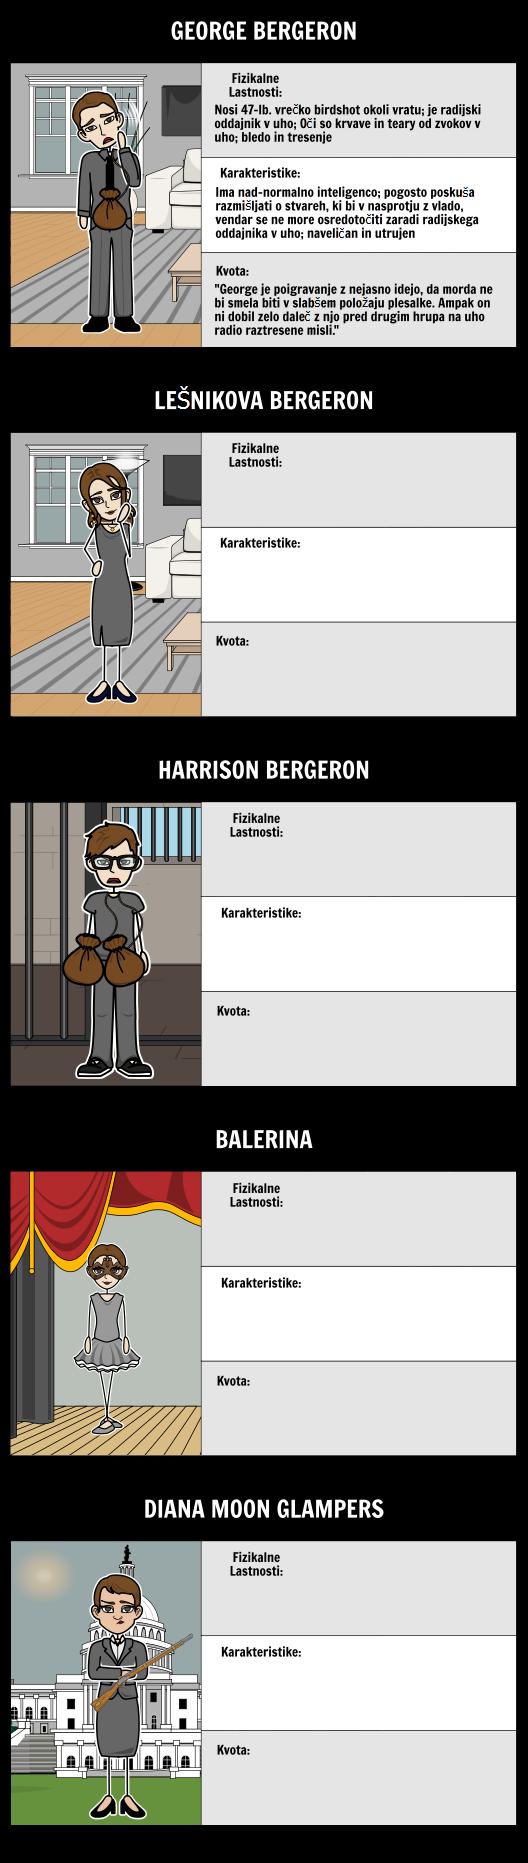 Tabela Znakov za Harrison Bergeron